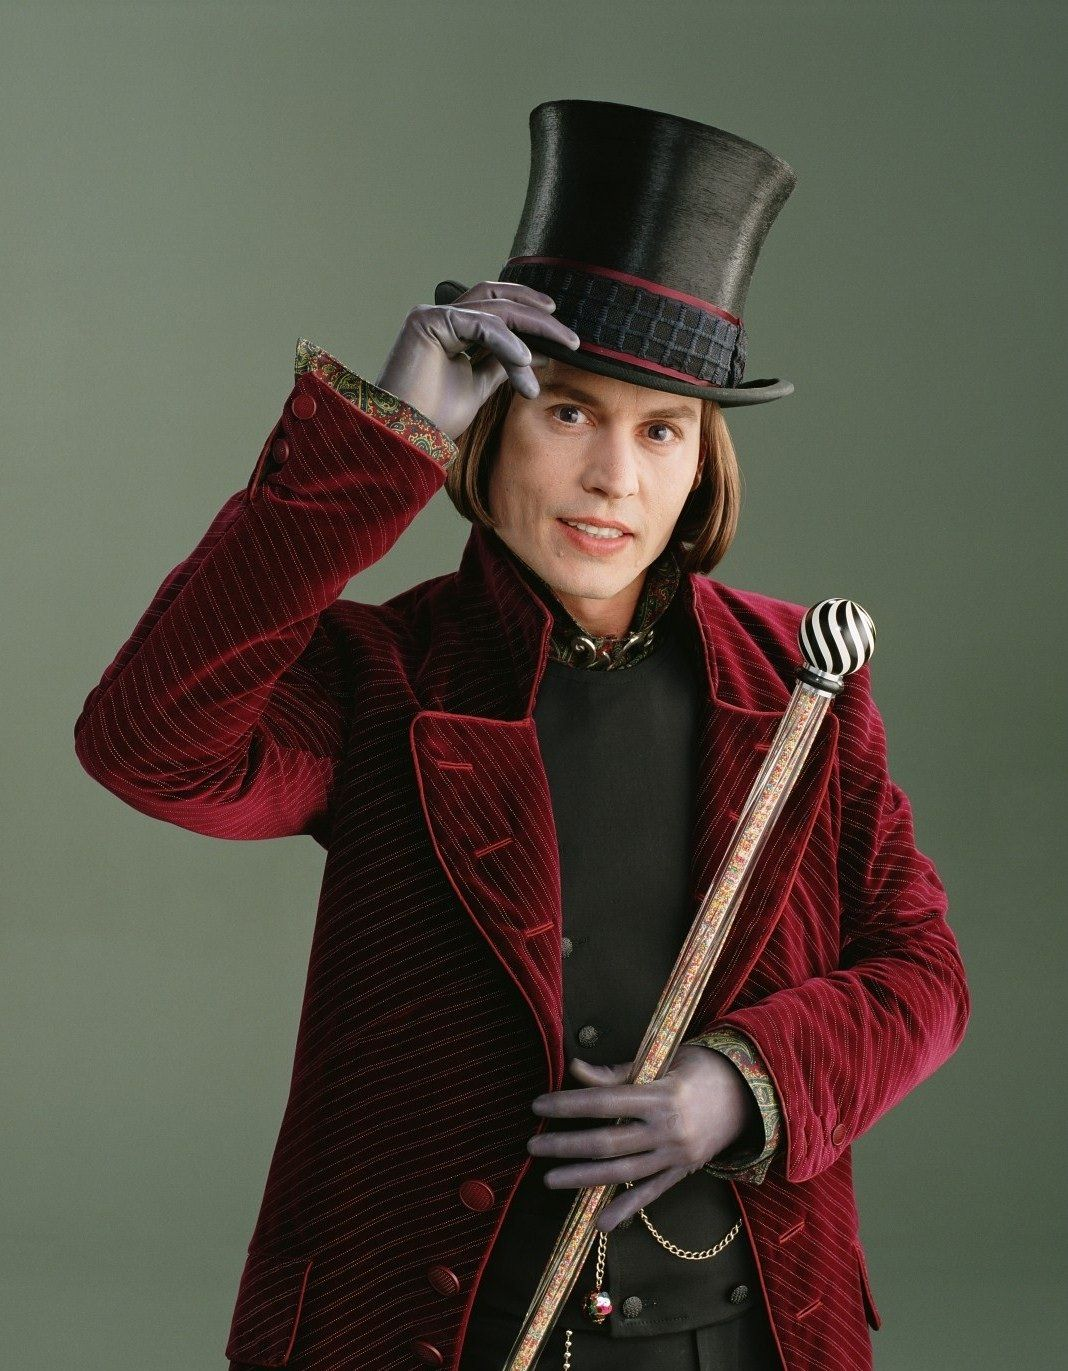 Johnny Depp Willy Wonka Costume